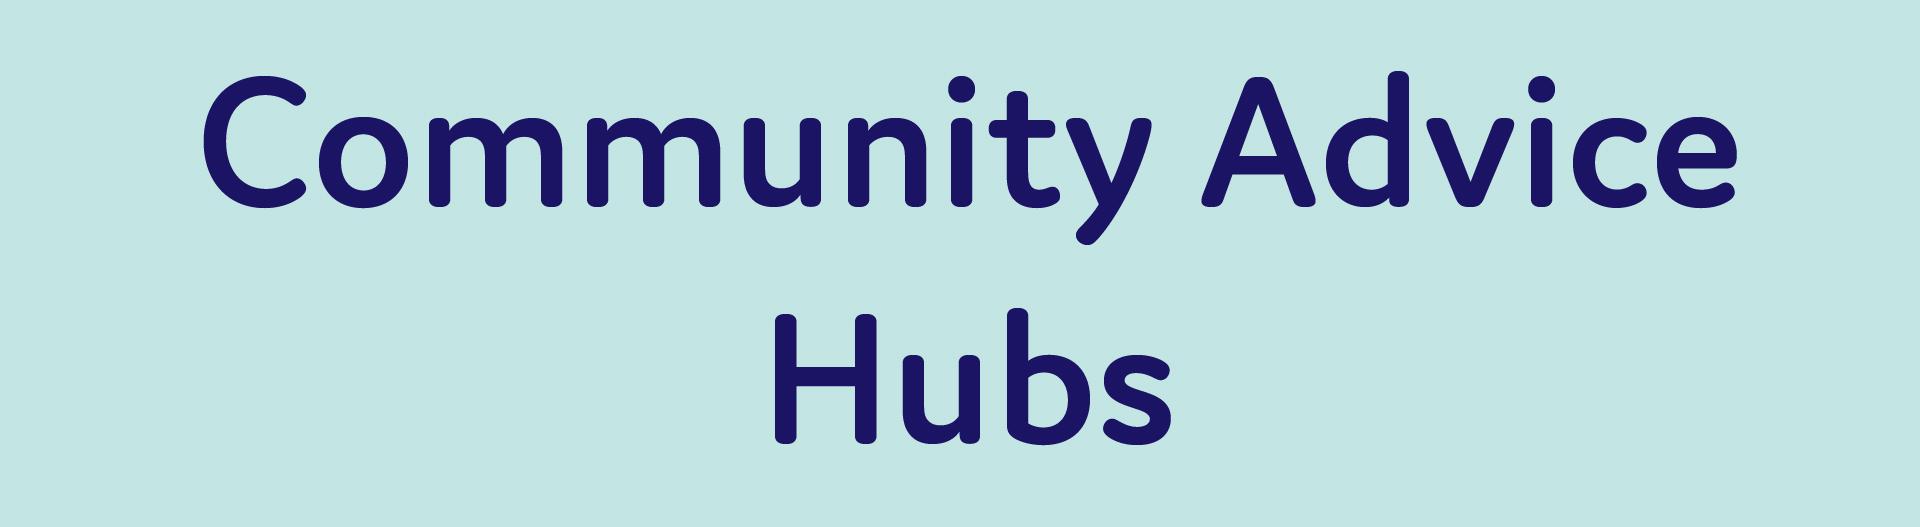 Community Advice Hubs-01